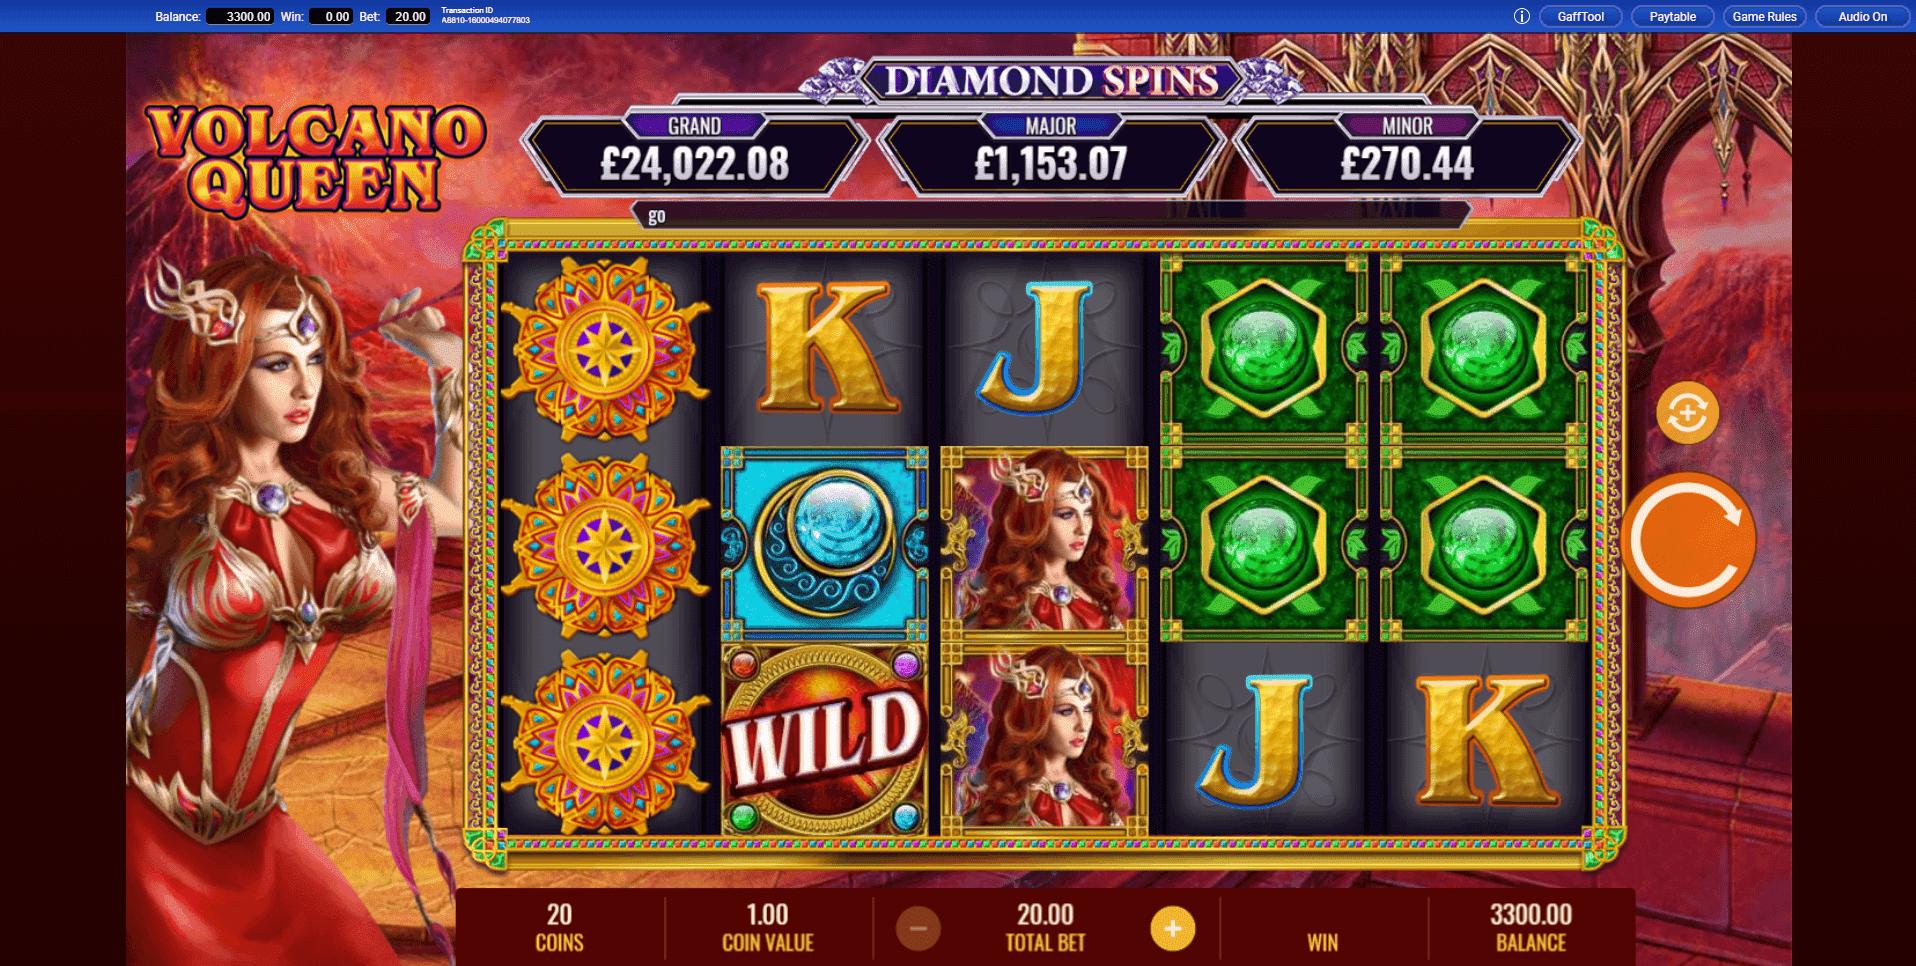 Volcano Queen Diamond Spins slot machine screenshot